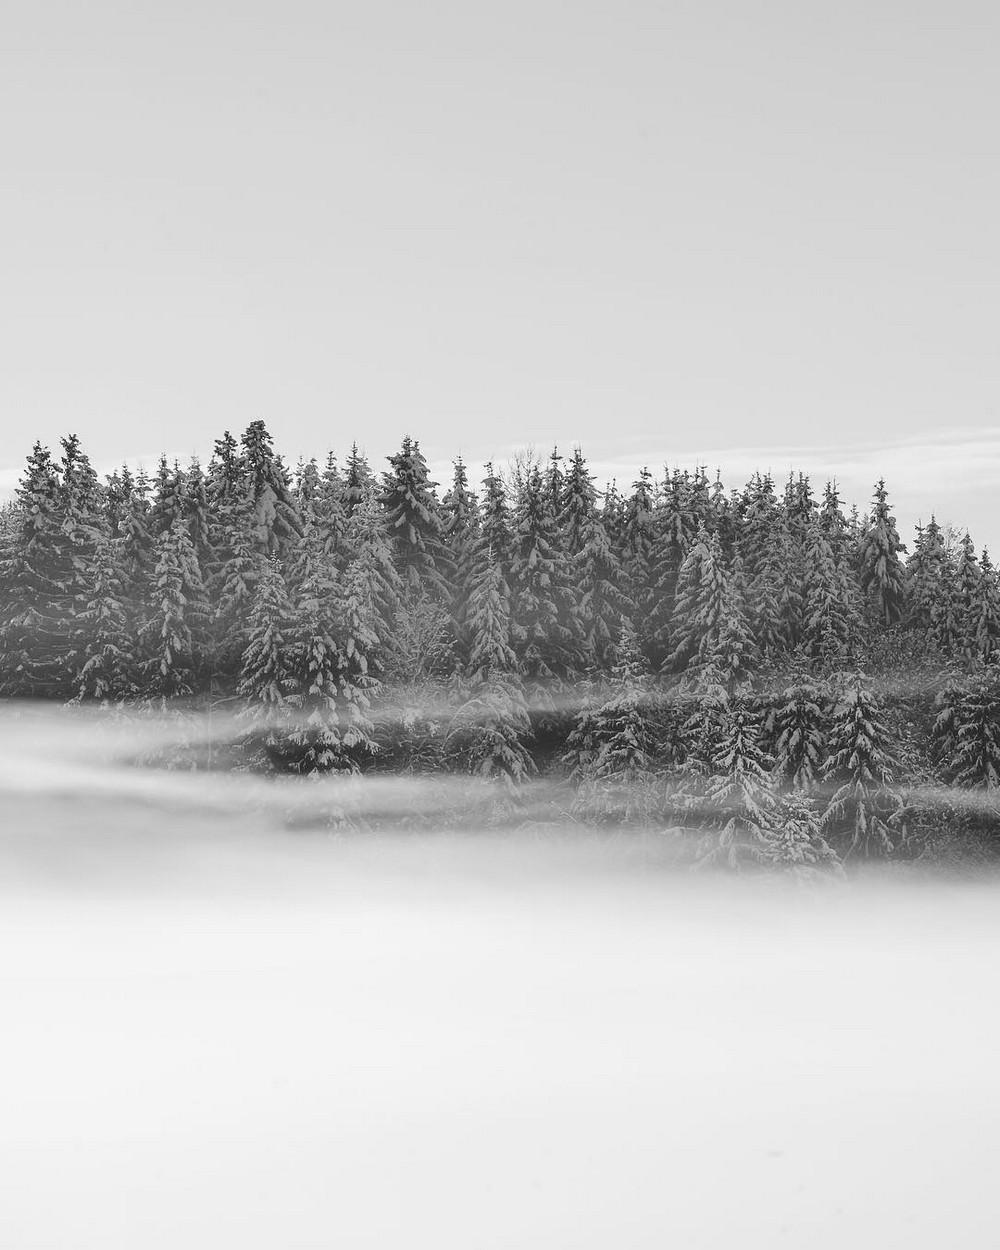 fotografii_norvegiji-5